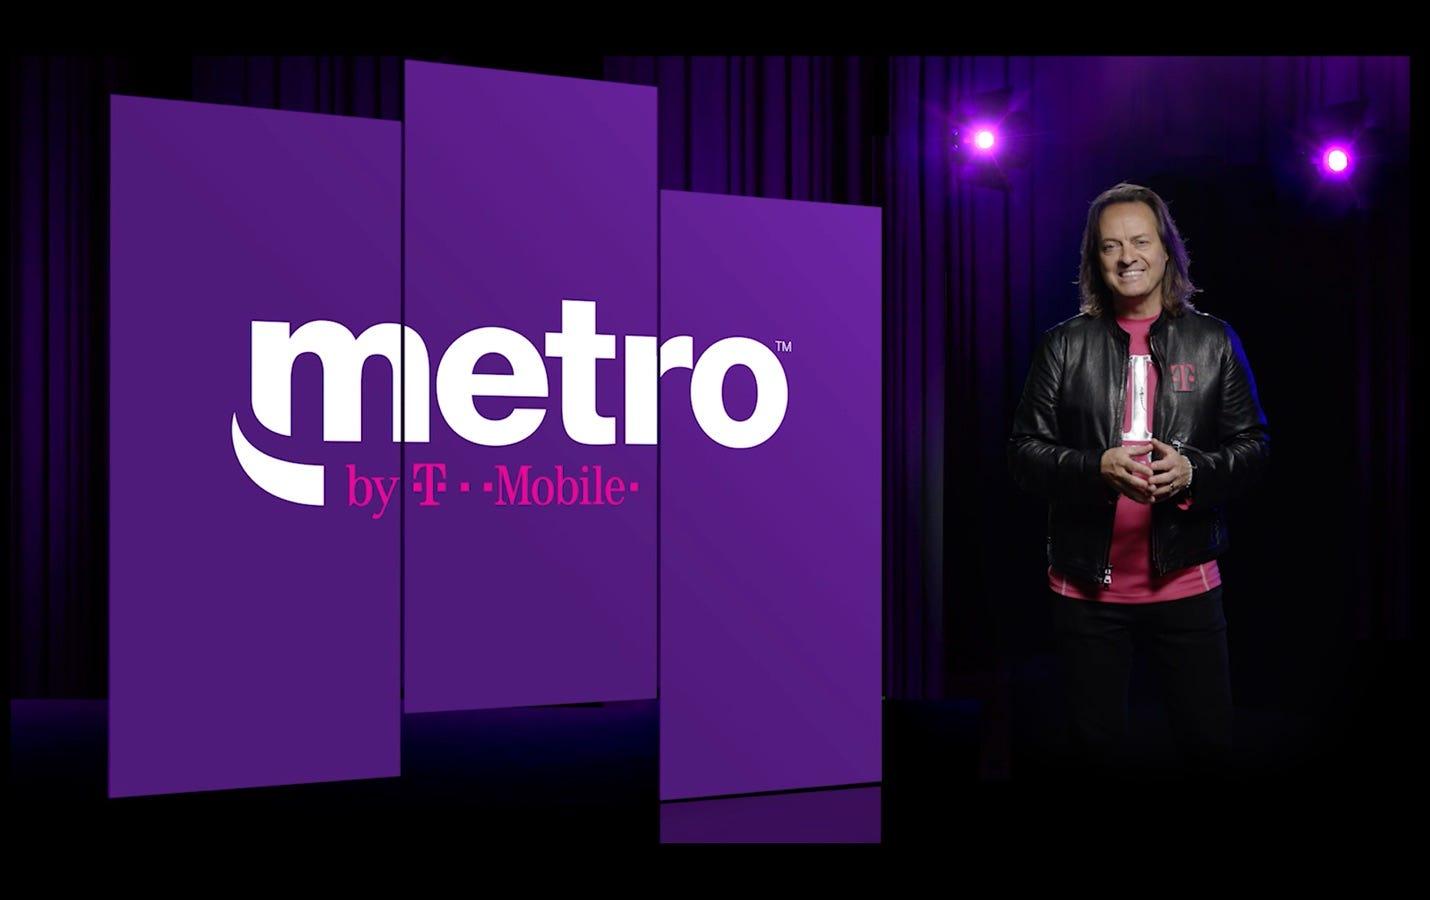 T-Mobile\u0027s Metro brand promises 5G wireless service in 2019